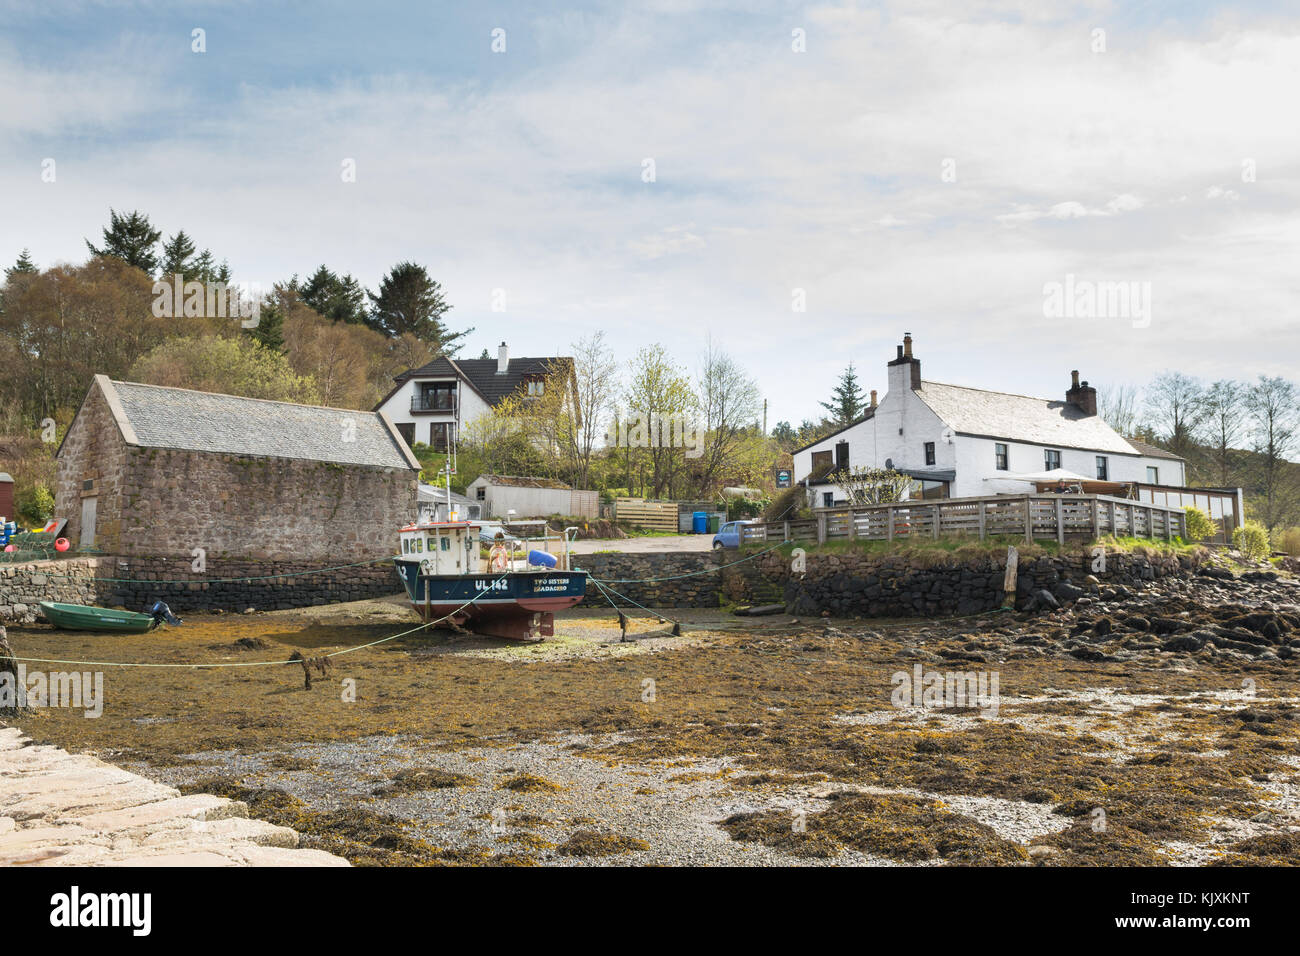 Badachro Inn and jetty at low tide, Badachro, Gairloch, Ross-shire, Scotland, UK - Stock Image